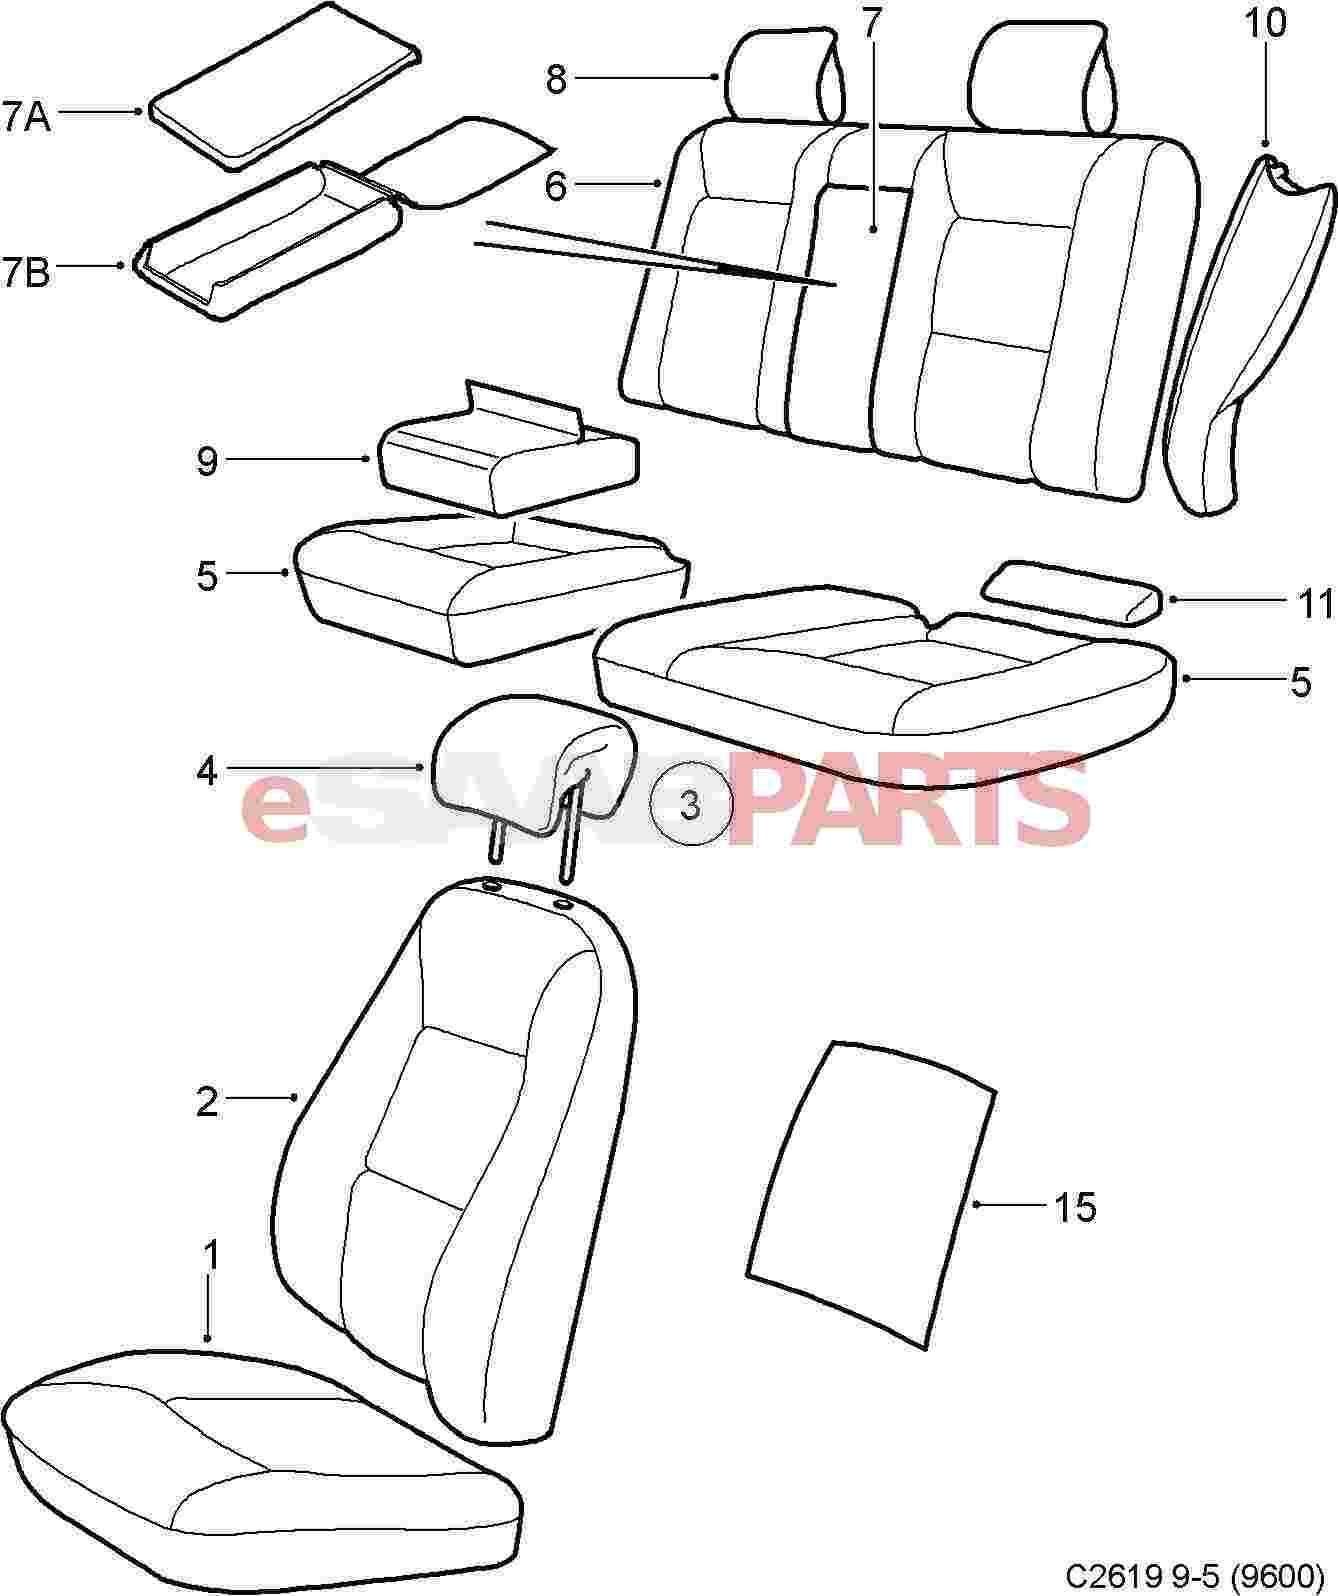 tags: #hisun utv parts diagram#hisun utv motor#hisun utv accessories#hisun  800 utv bumper#hisun utv parts and accessories#hisun motors 700 4x4 utv#hisun  800